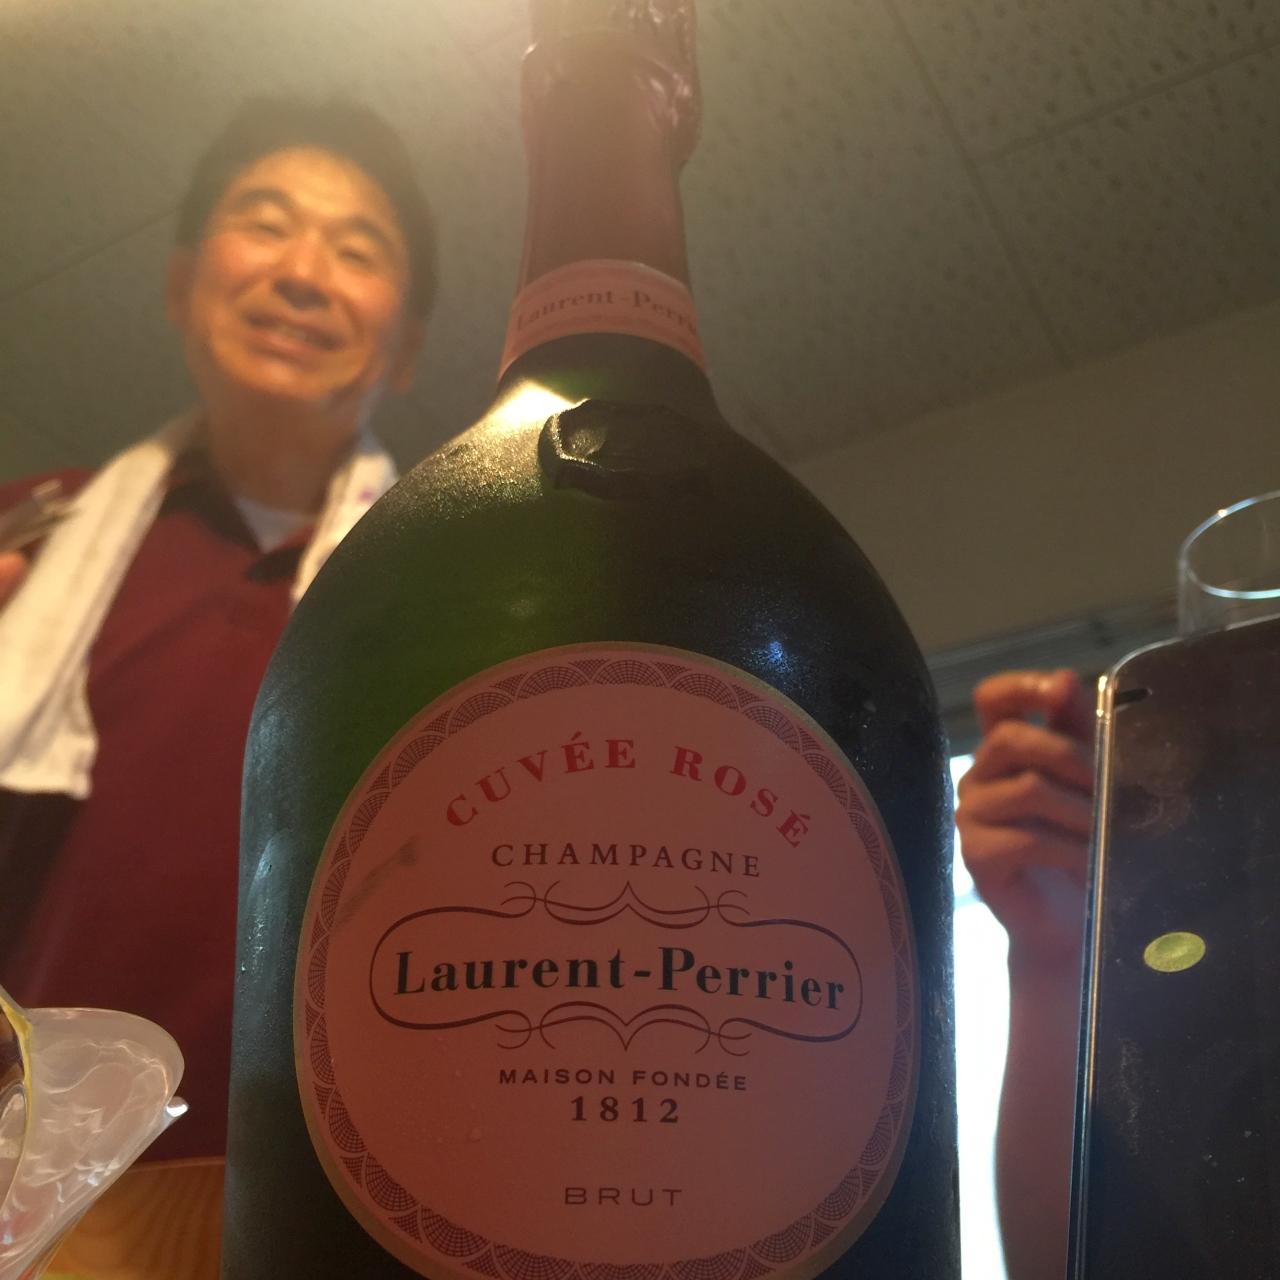 Laurent-perrier ローランペリエ キュヴェ ロゼ シャンパン